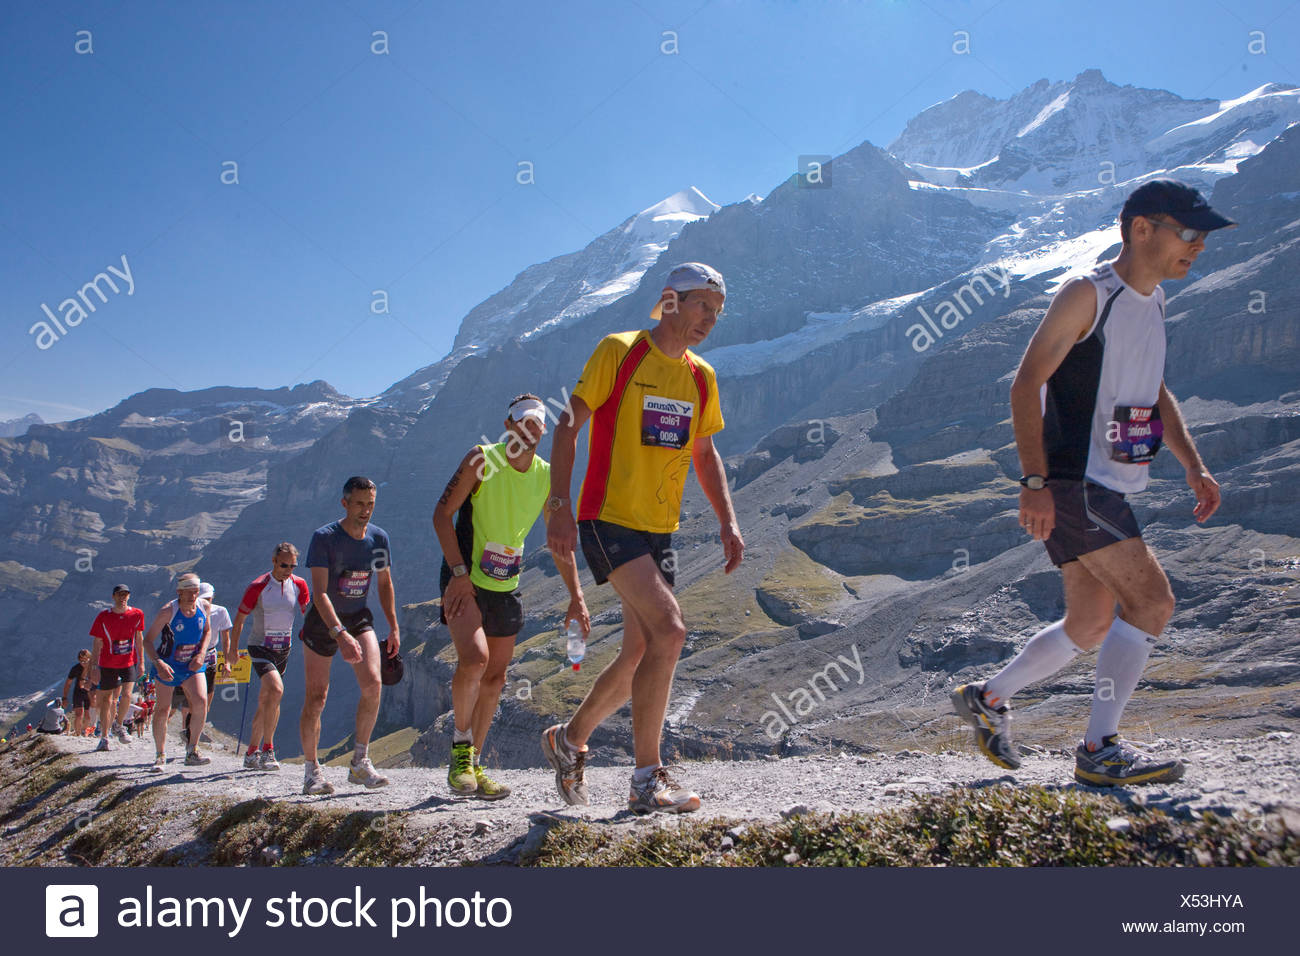 Jungfrau marathon, marathon, mountain run, run, sport, nicest mountain scenery, landscape, mountain, mountains, mountain road, s - Stock Image